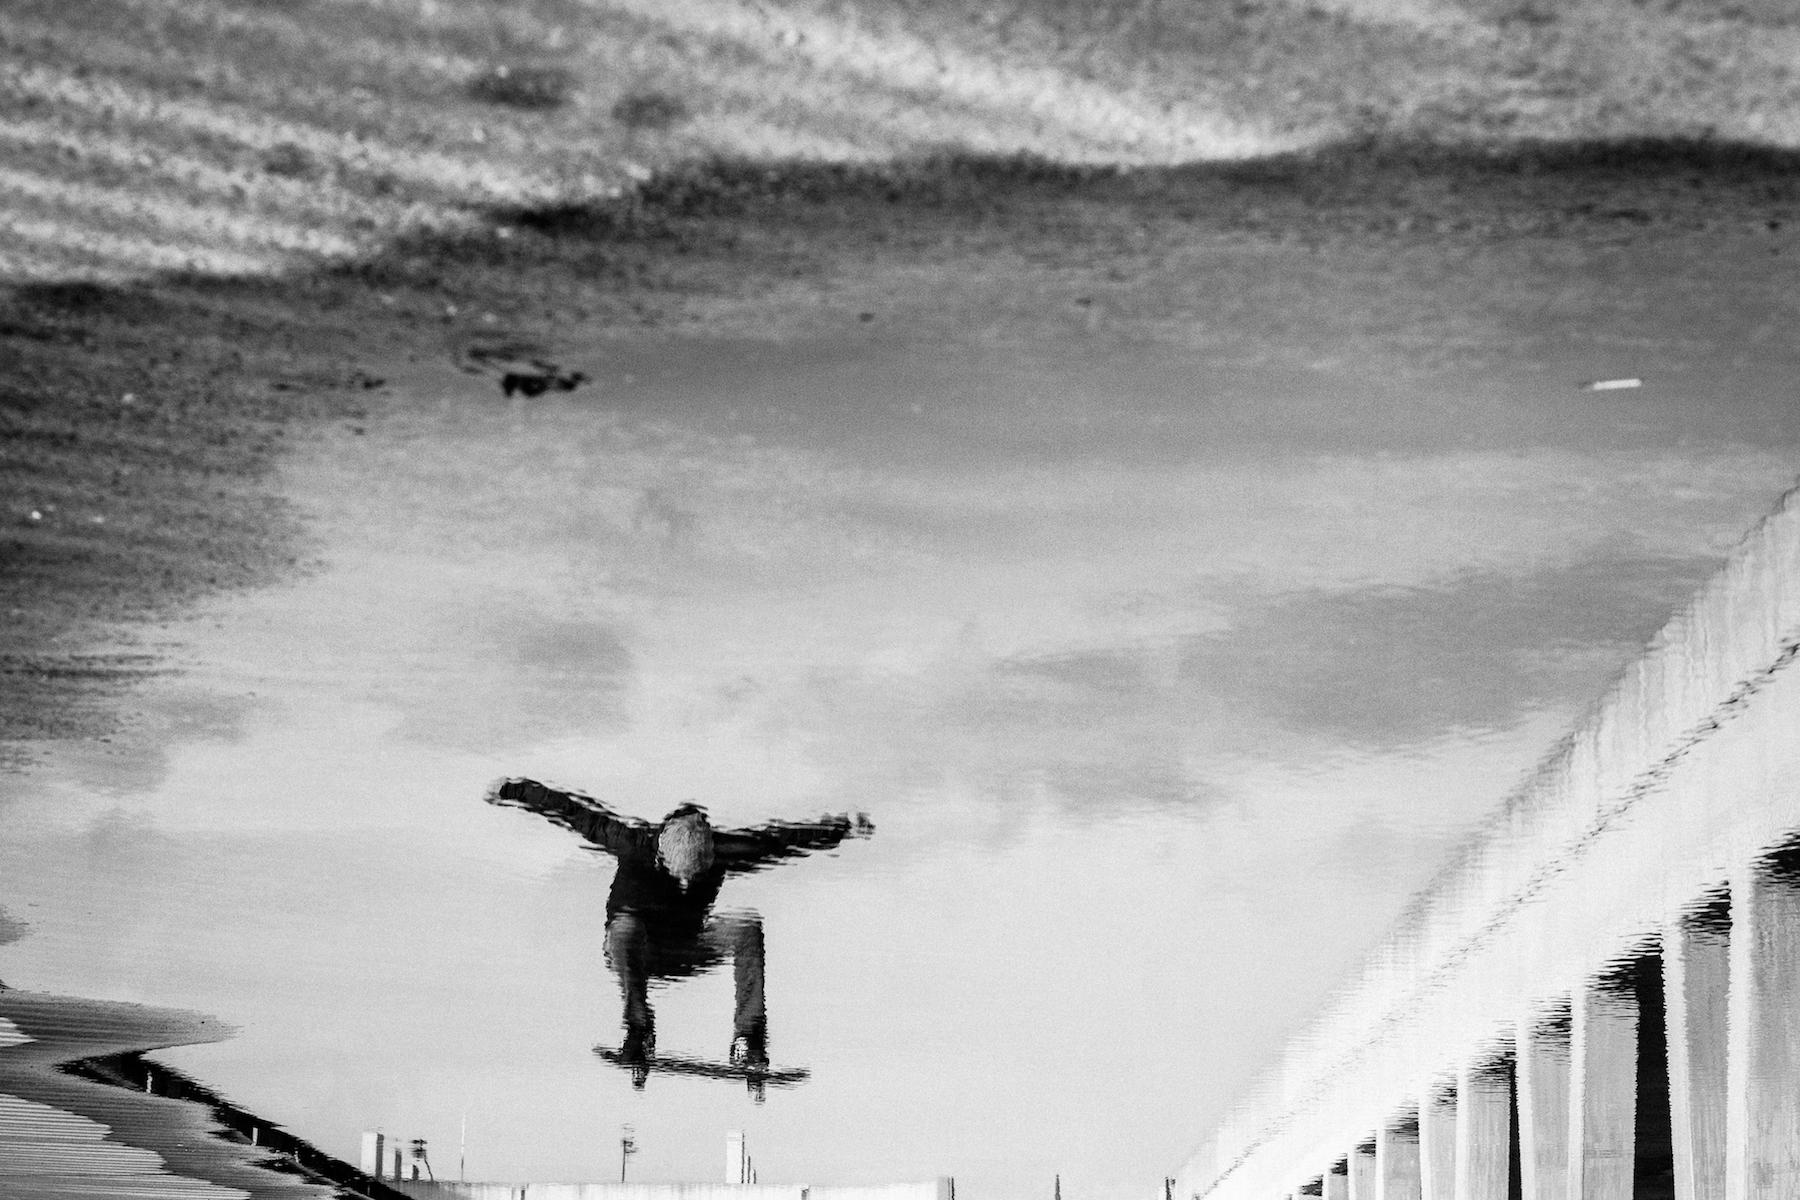 luke-paige-skate-photography-08